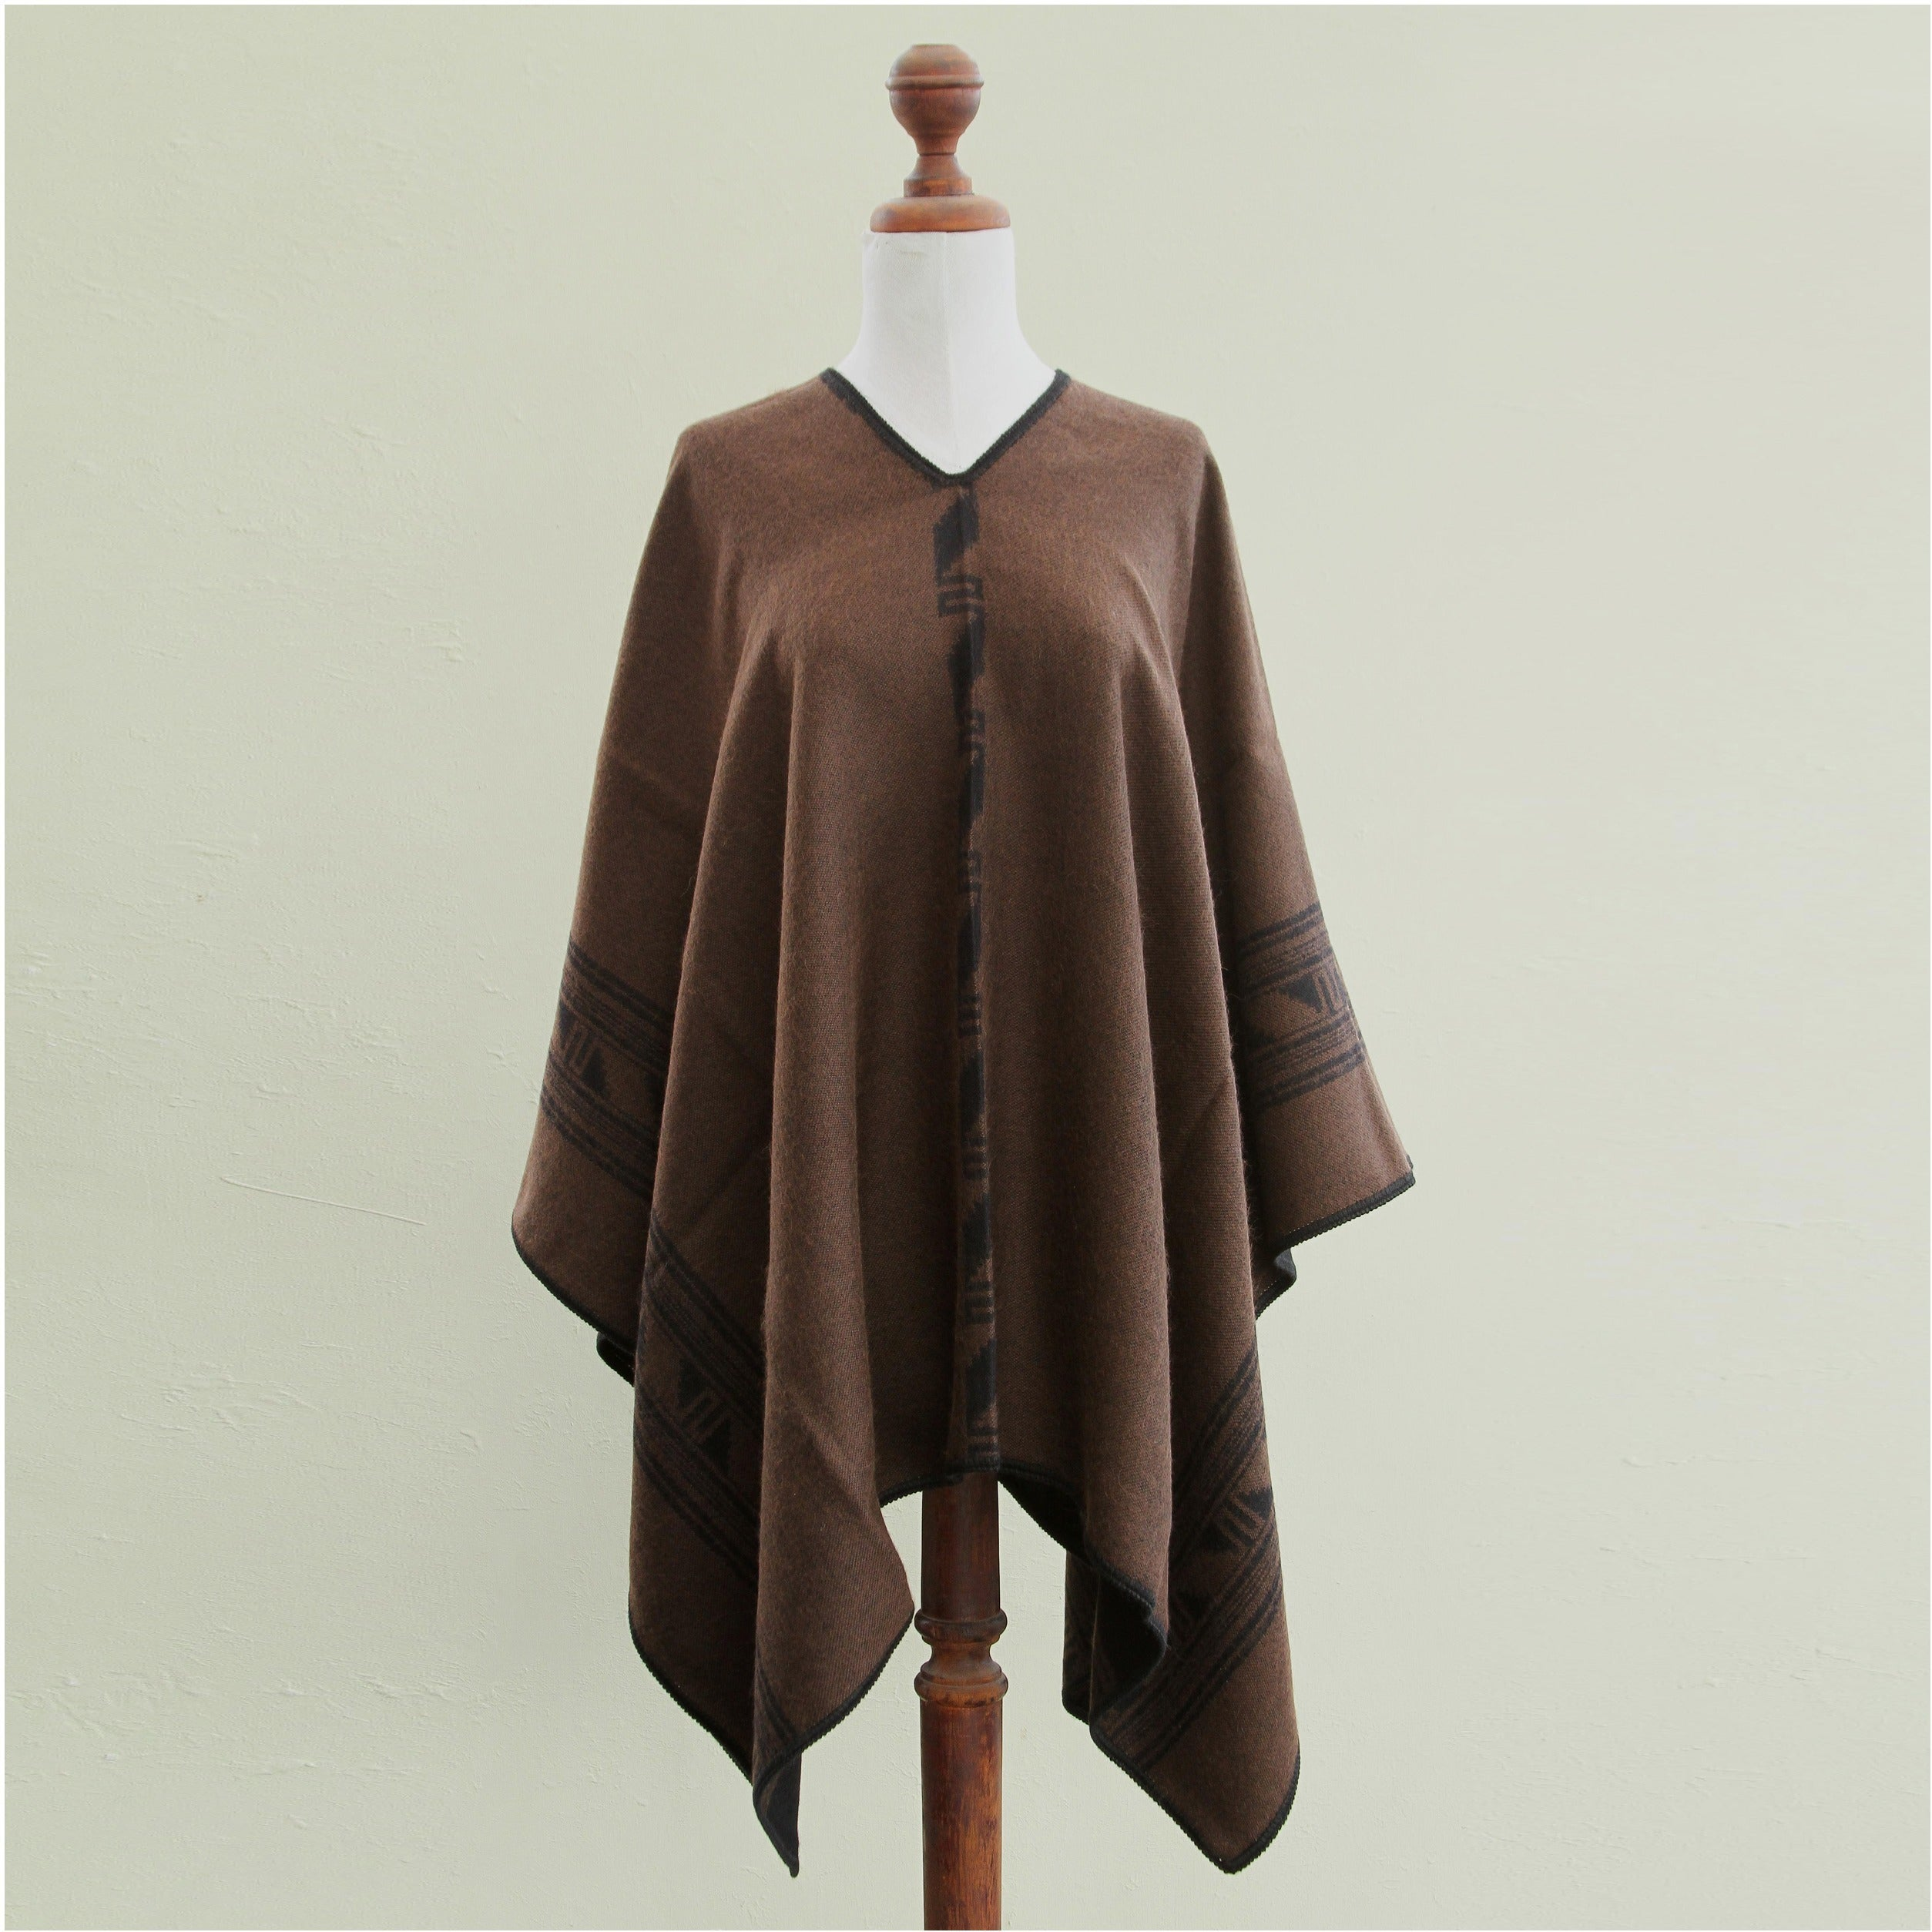 INTI ALPACA Black Alpaca Poncho for Women Knitted Cape with Alpaca Wool